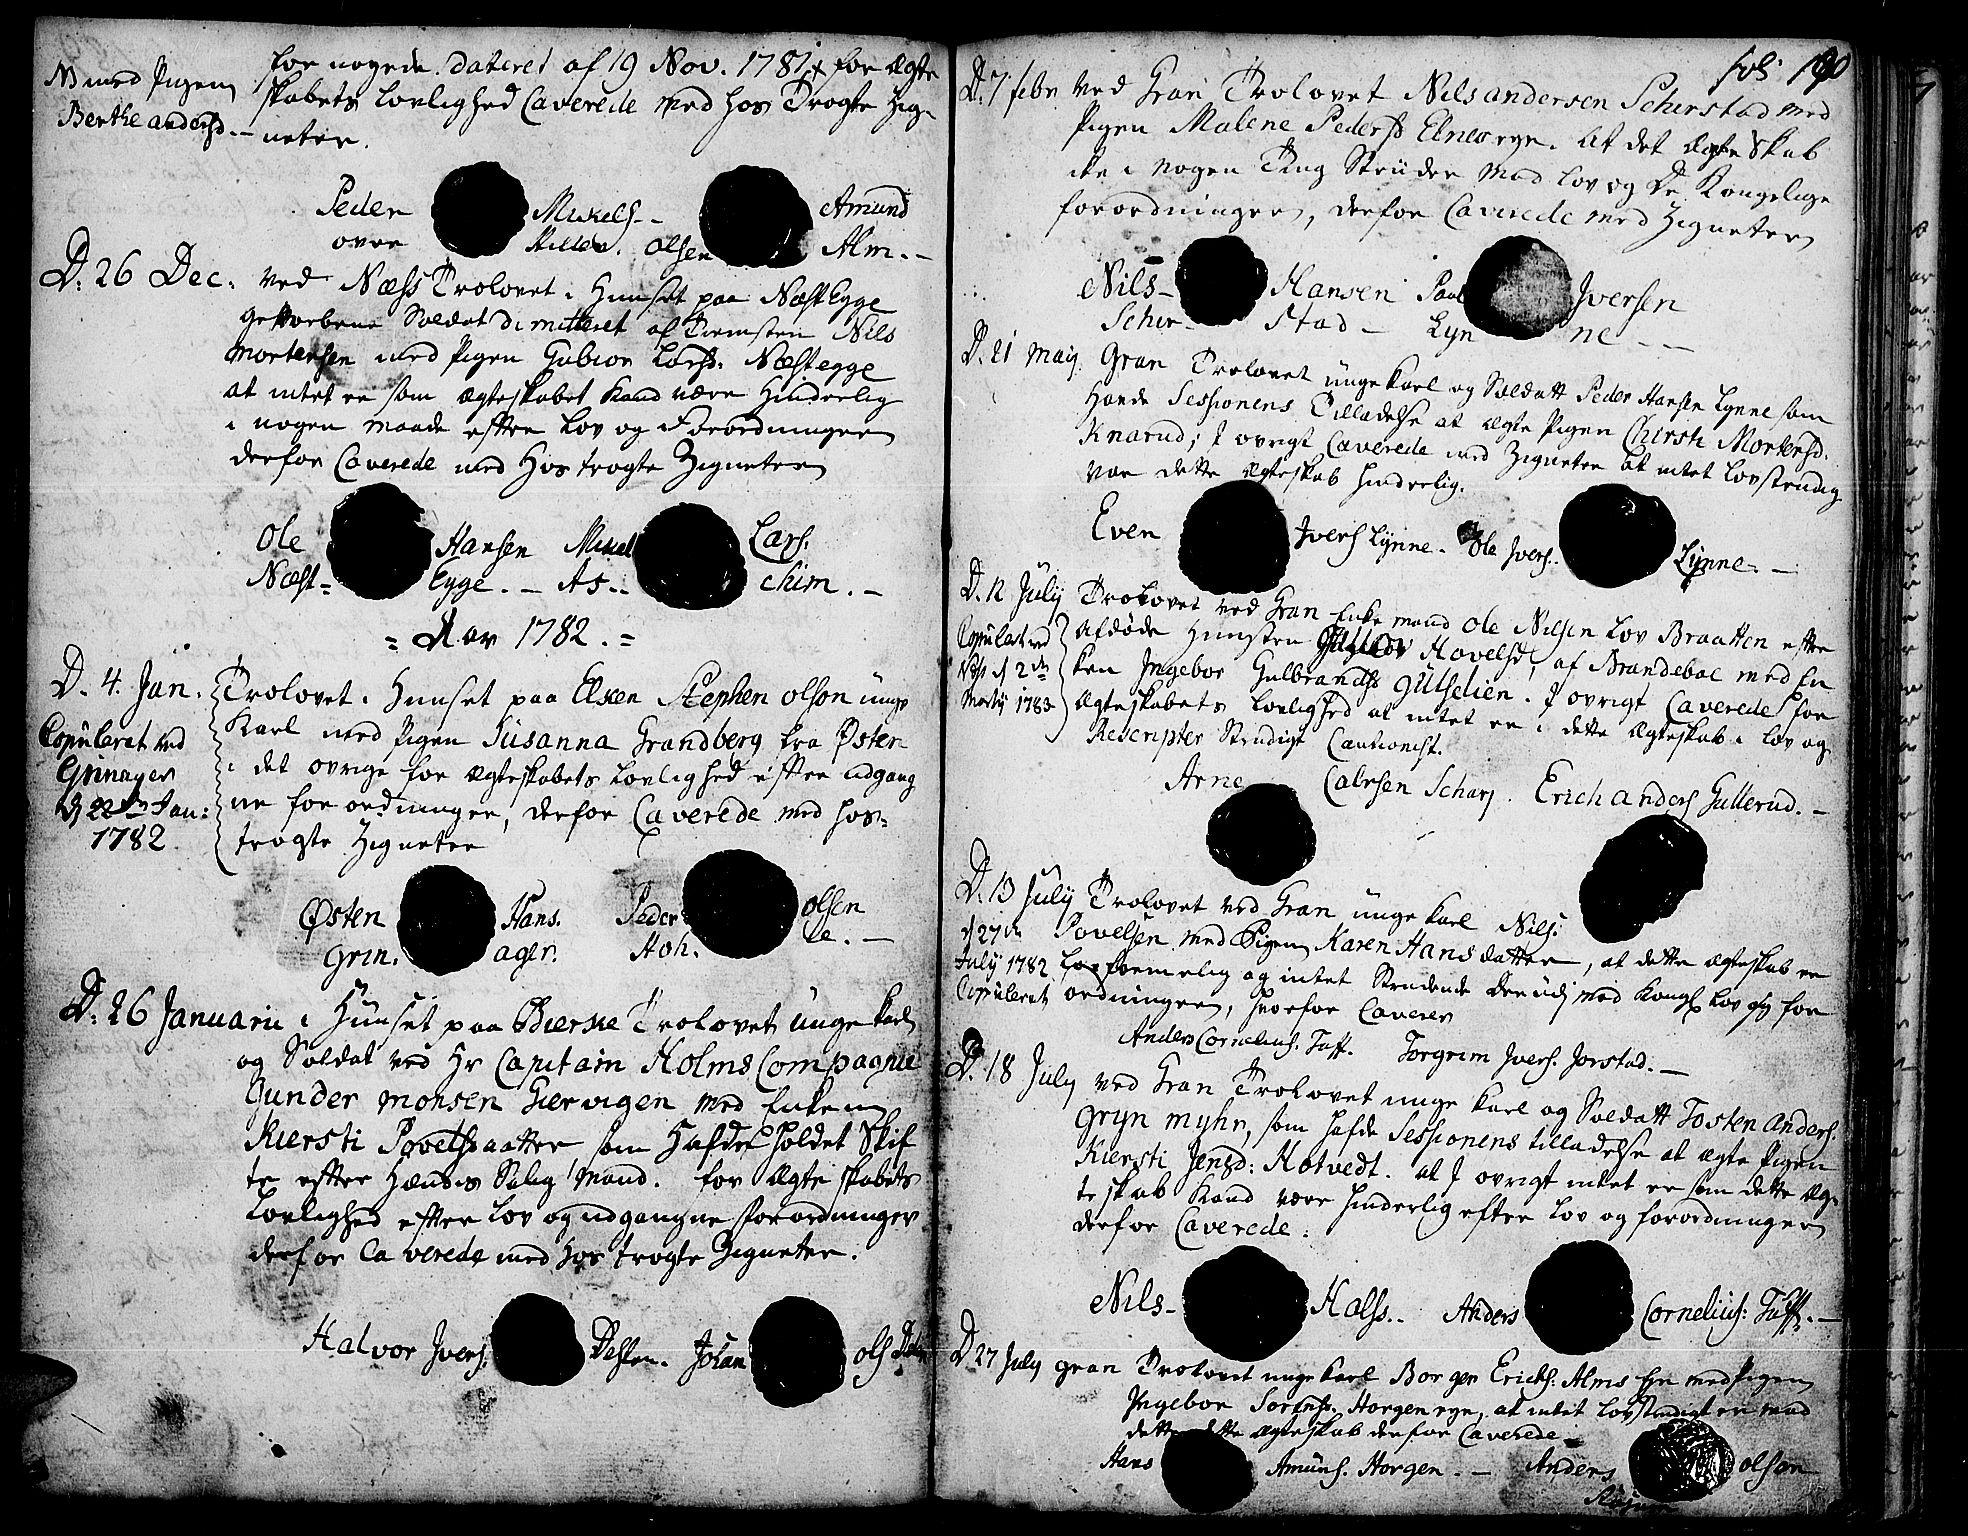 SAH, Gran prestekontor, Ministerialbok nr. 5, 1776-1788, s. 190